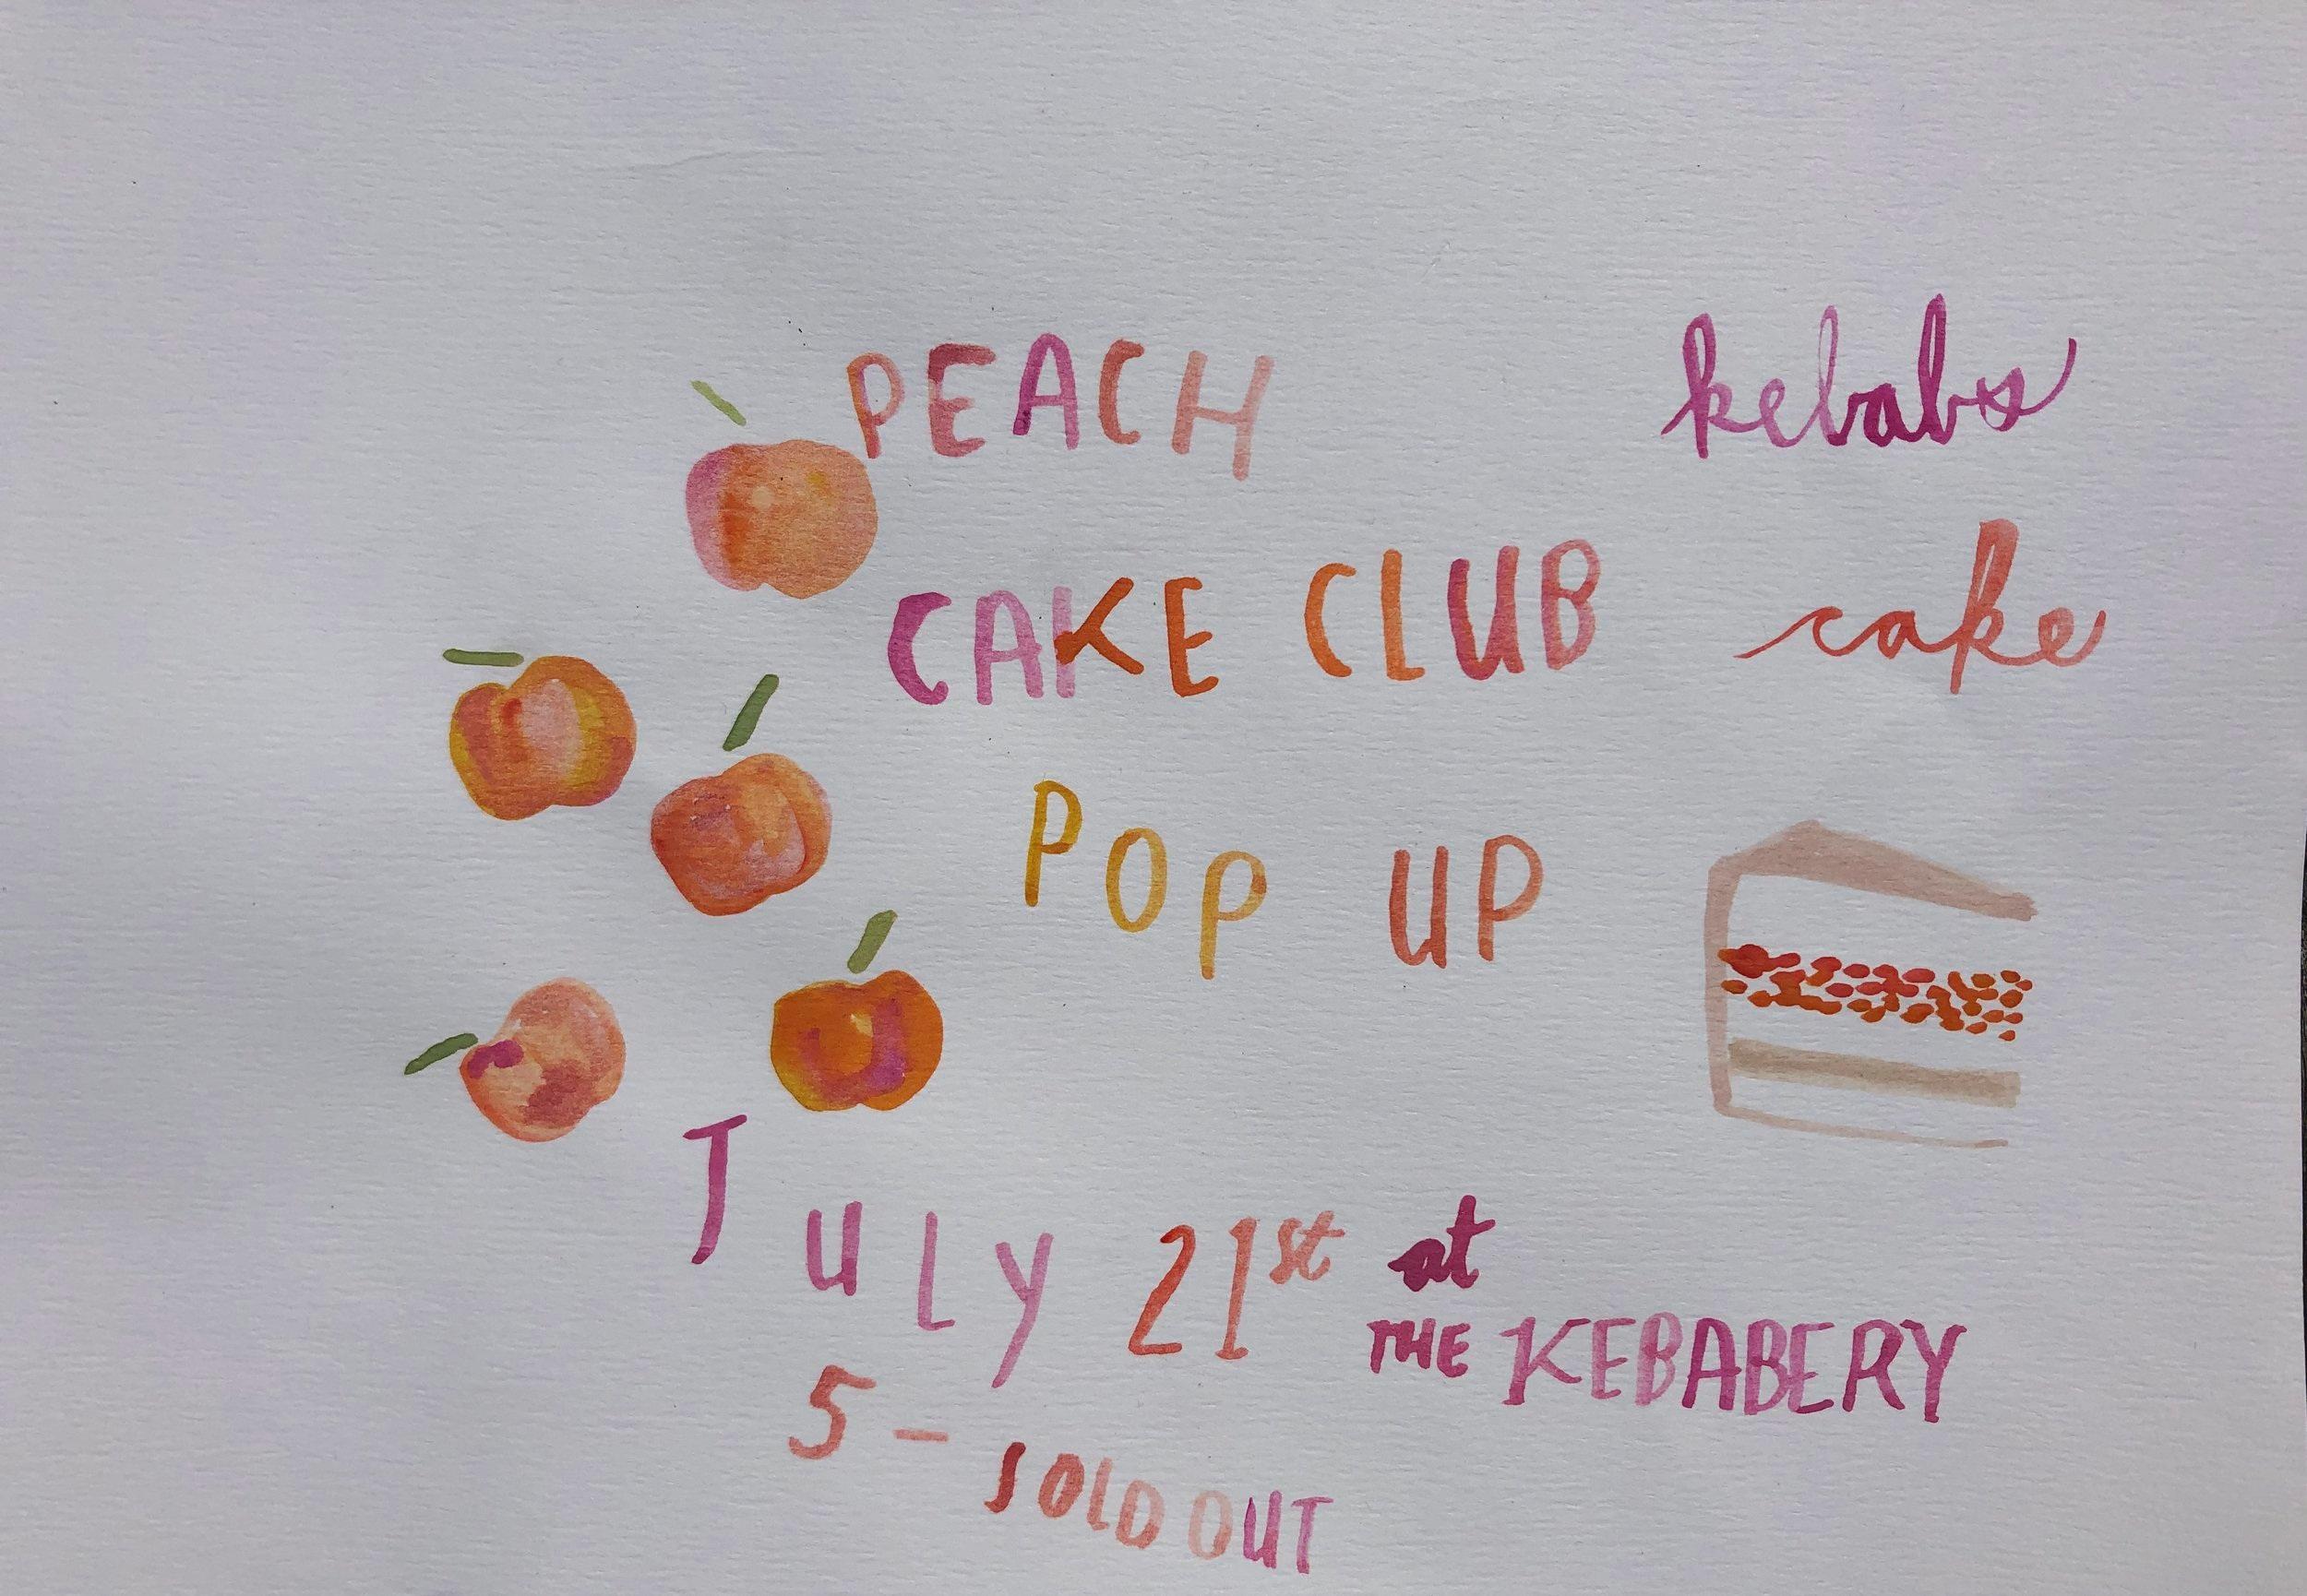 Peach Cake Club at The Kebabery